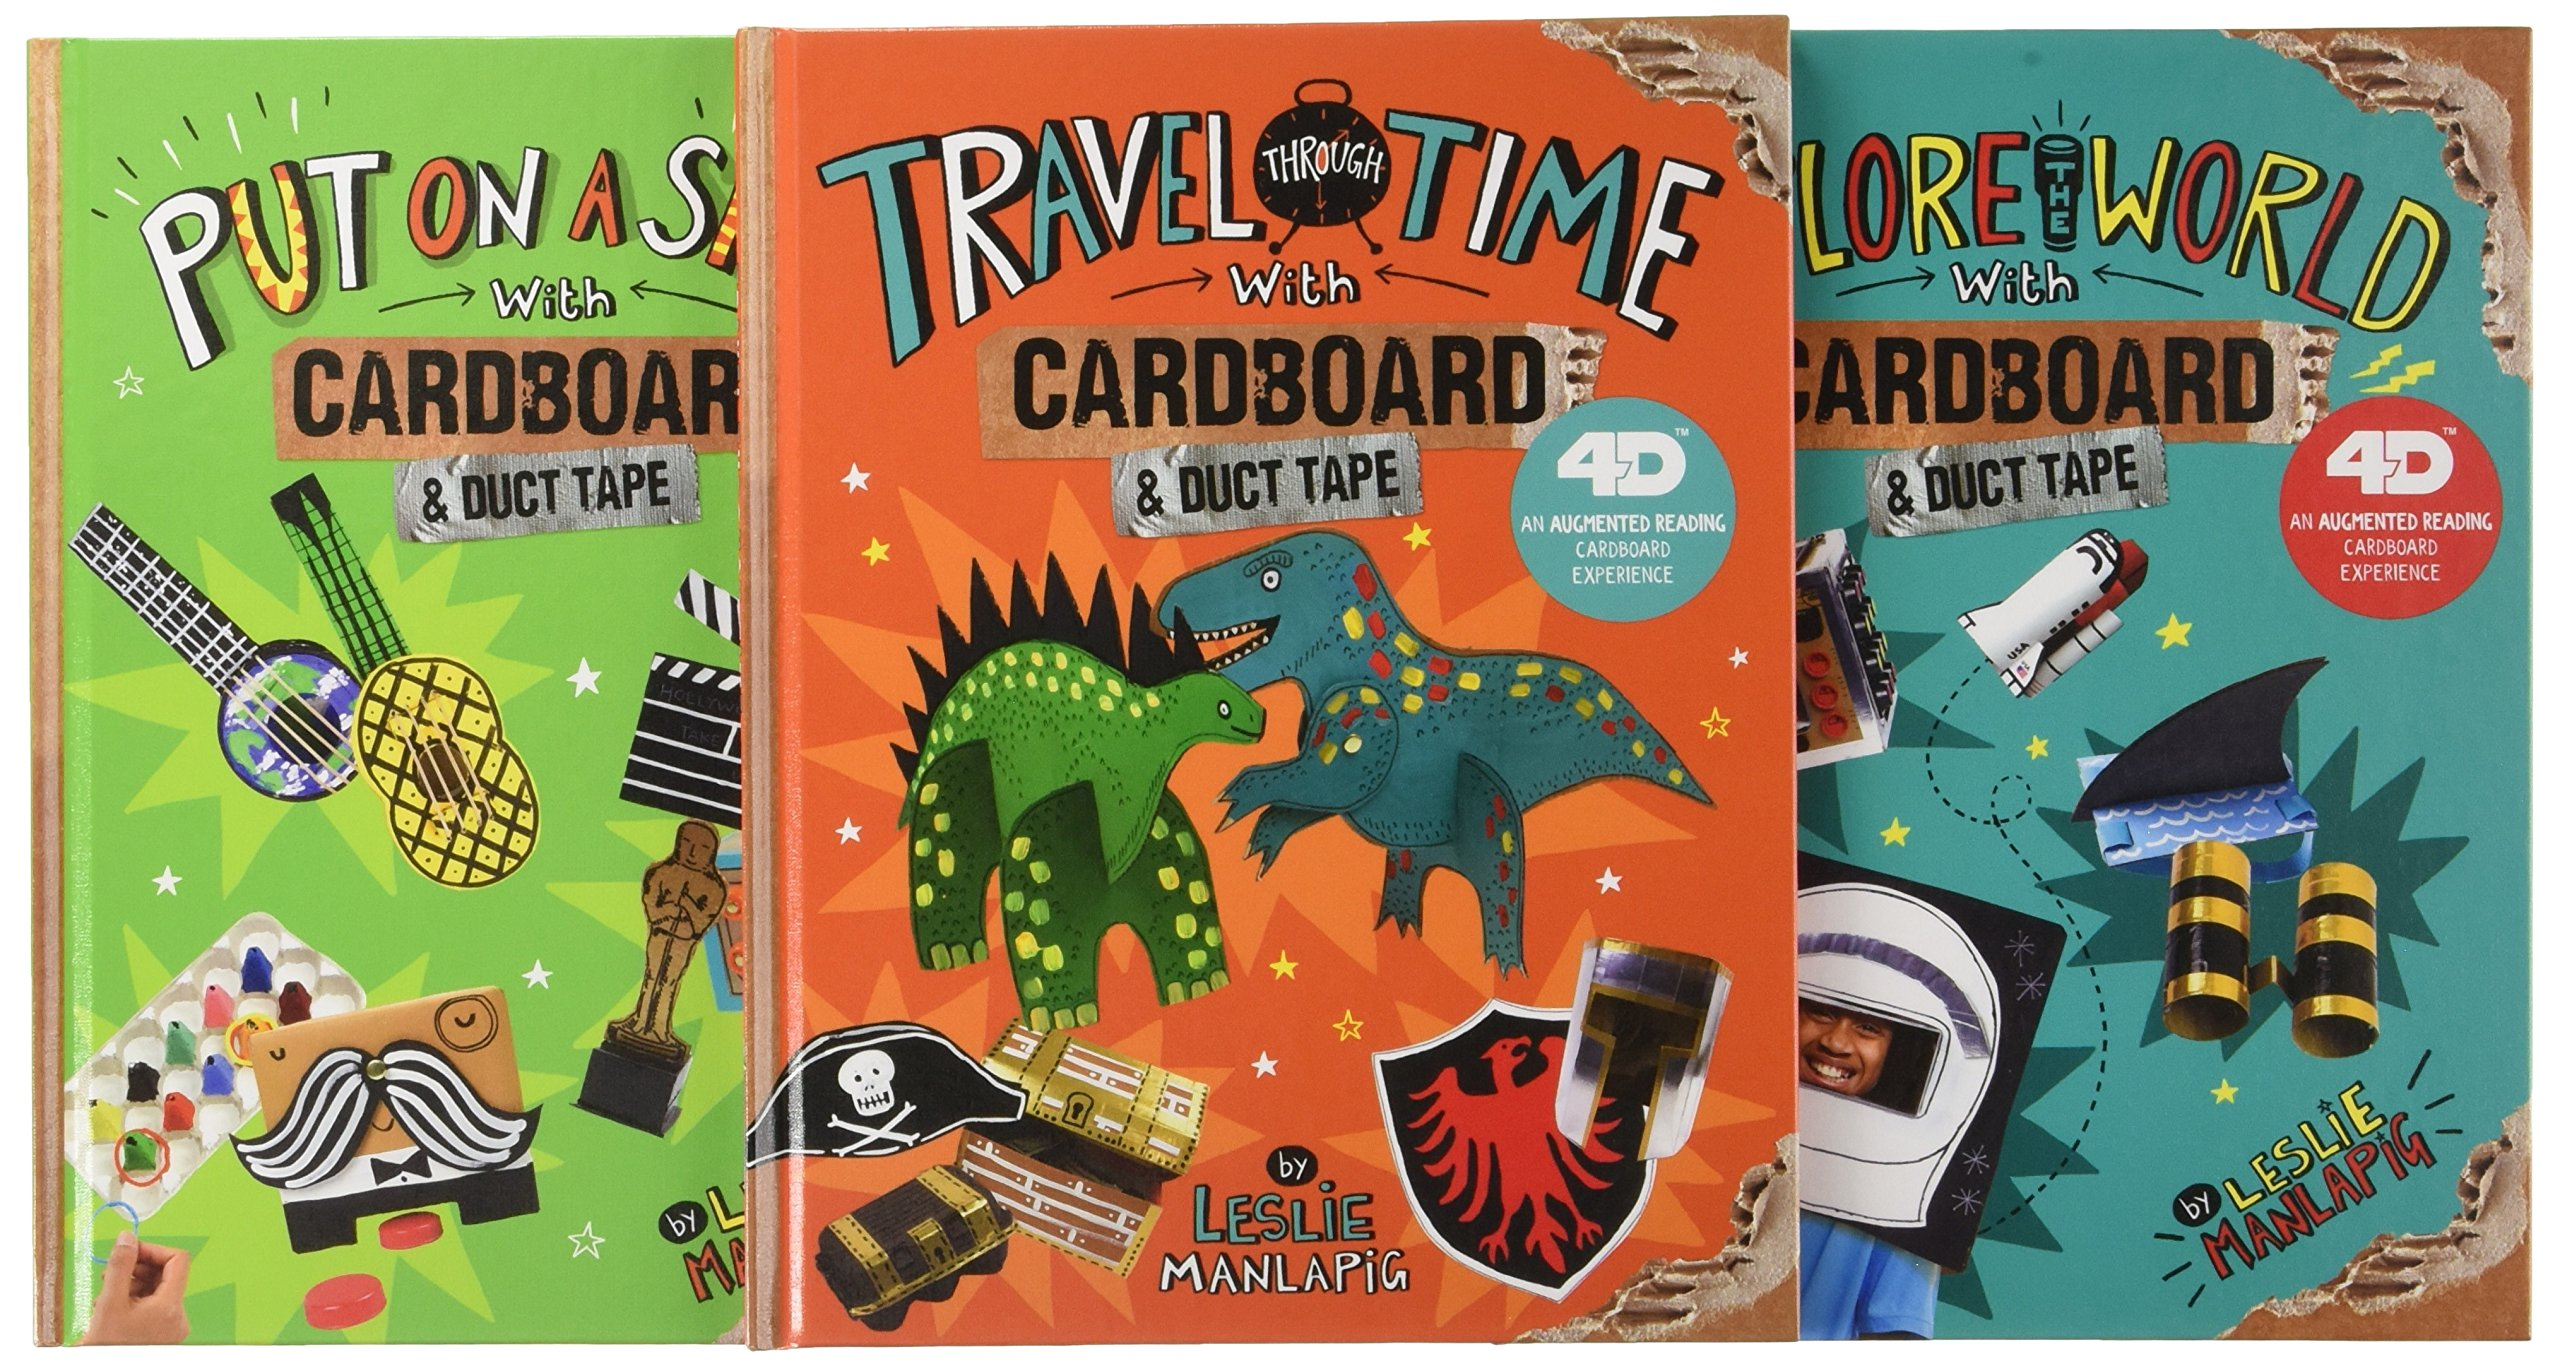 Epic Cardboard Adventures 4D